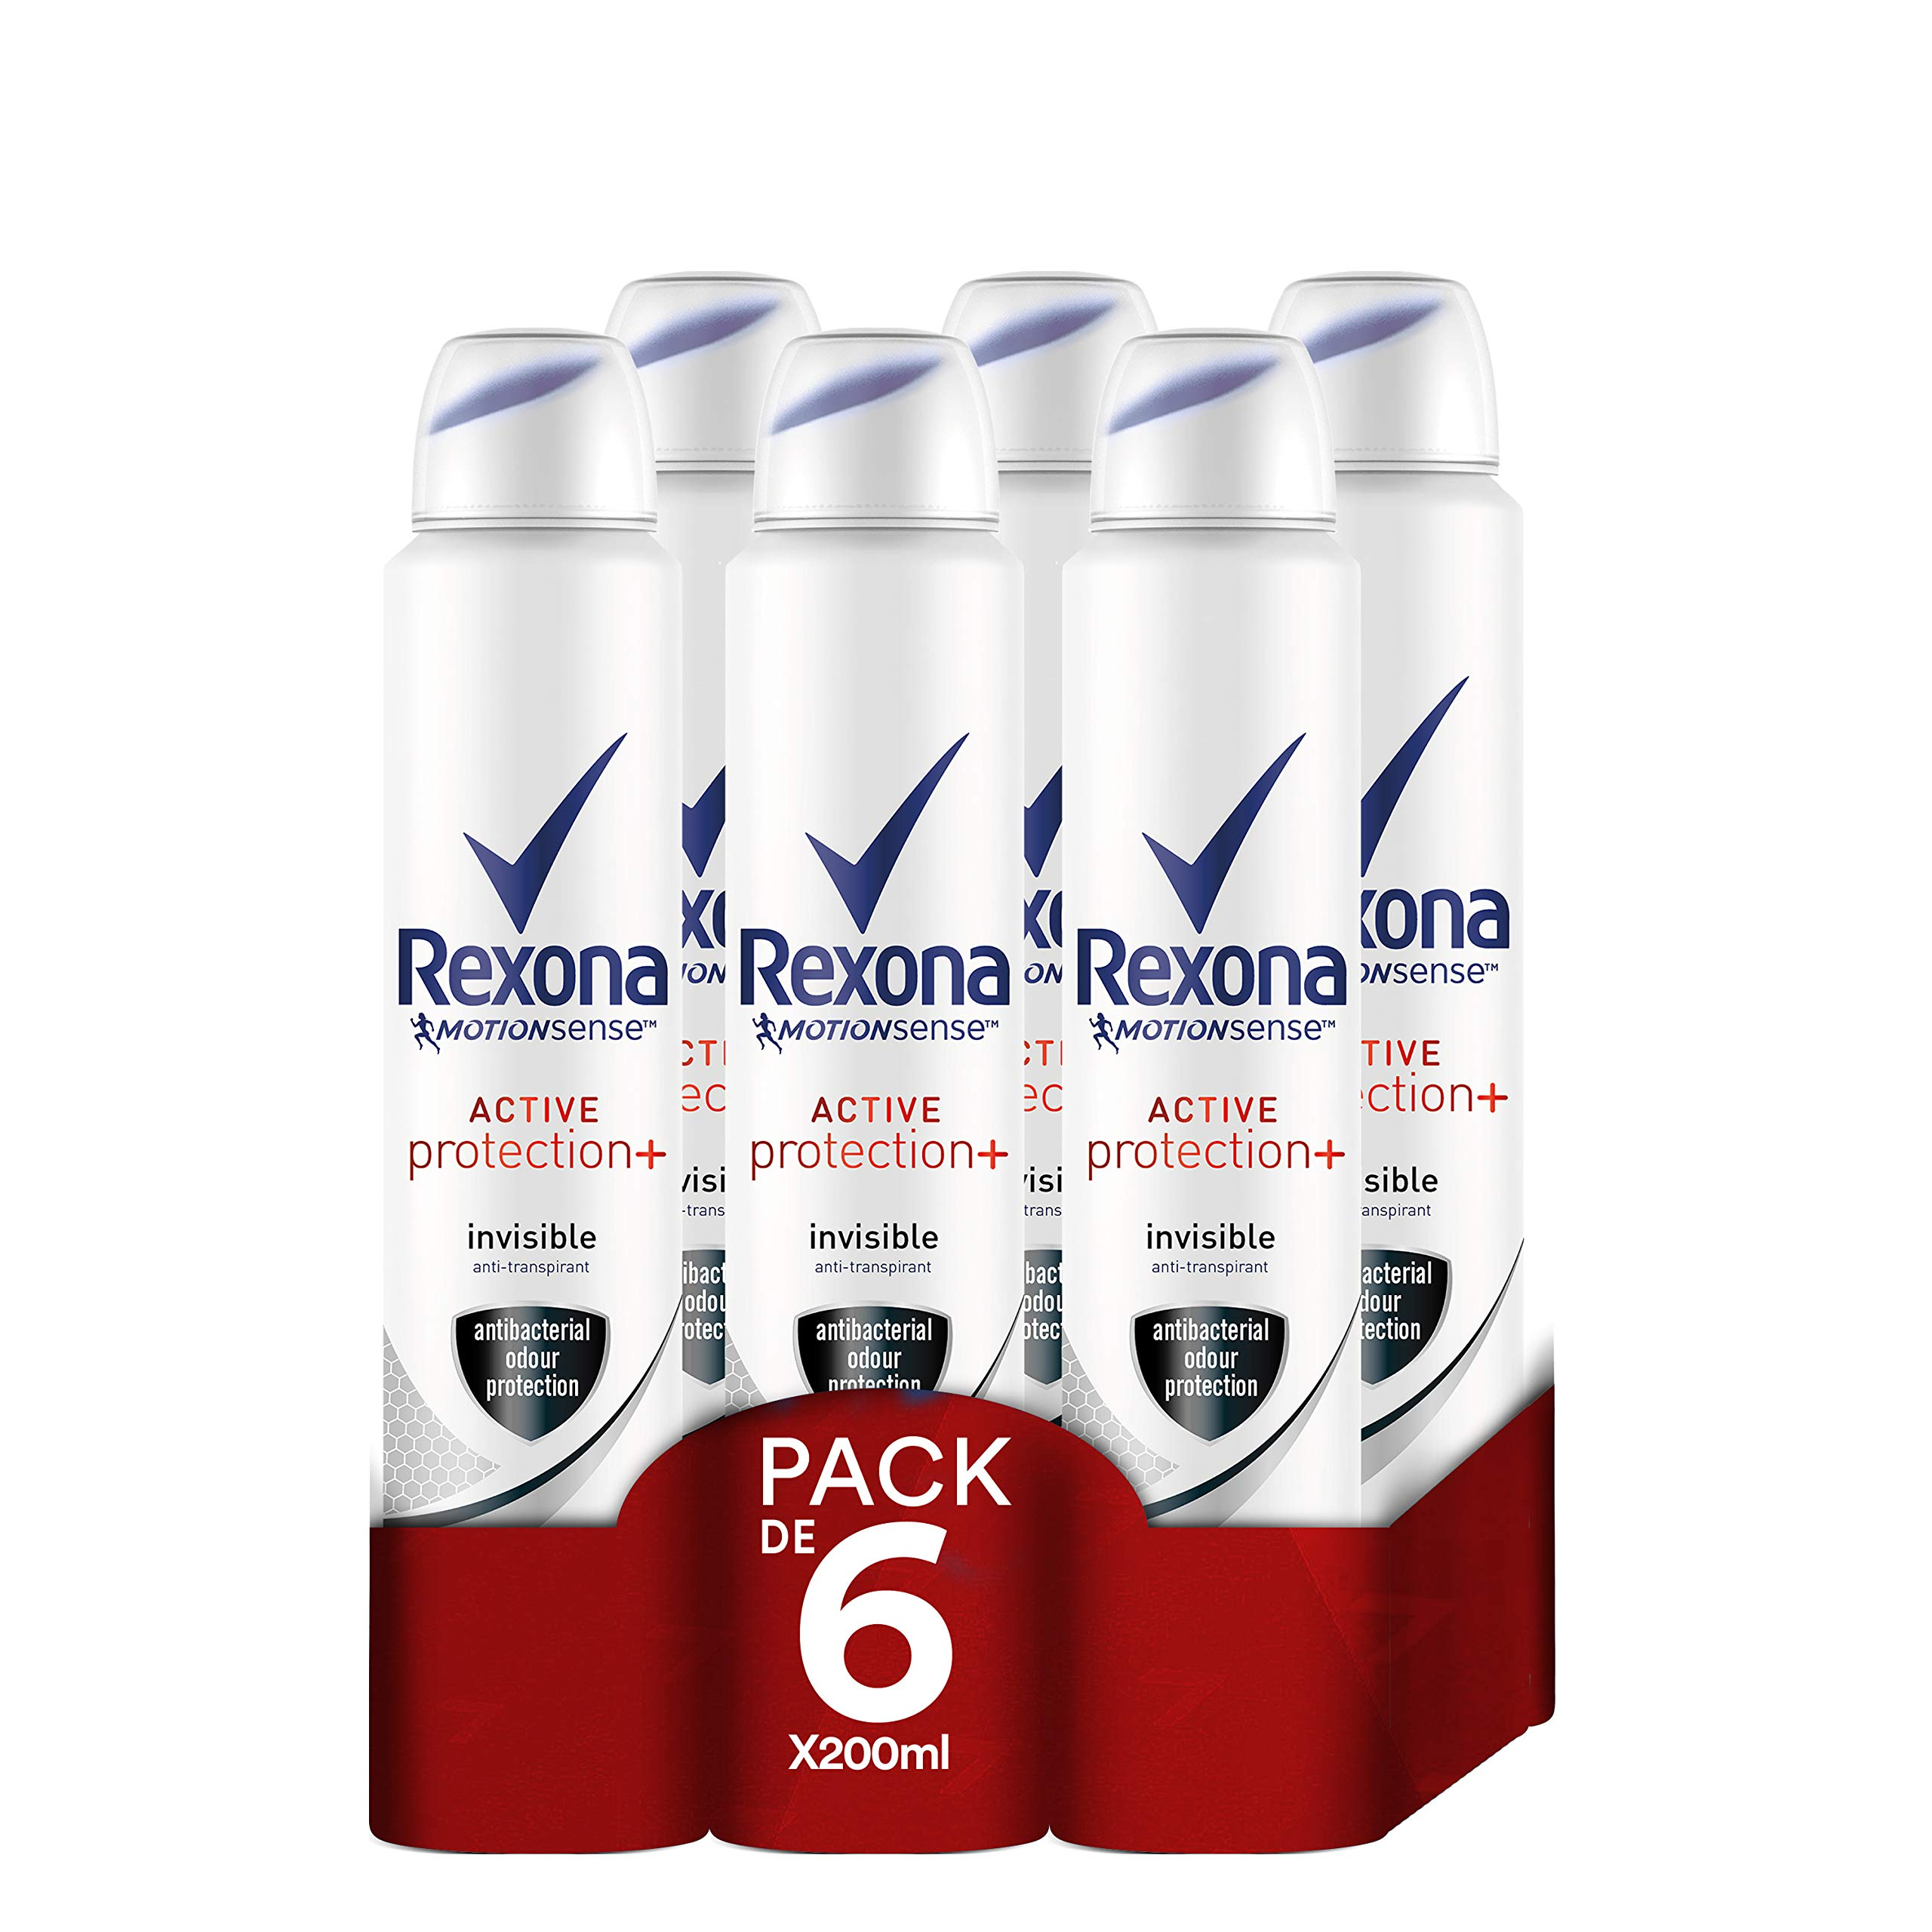 Rexona Active Pro+ Desodorante Antitranspirante Invisible Mujer - Pack de 6 x 200 ml (Total: 1200 ml)